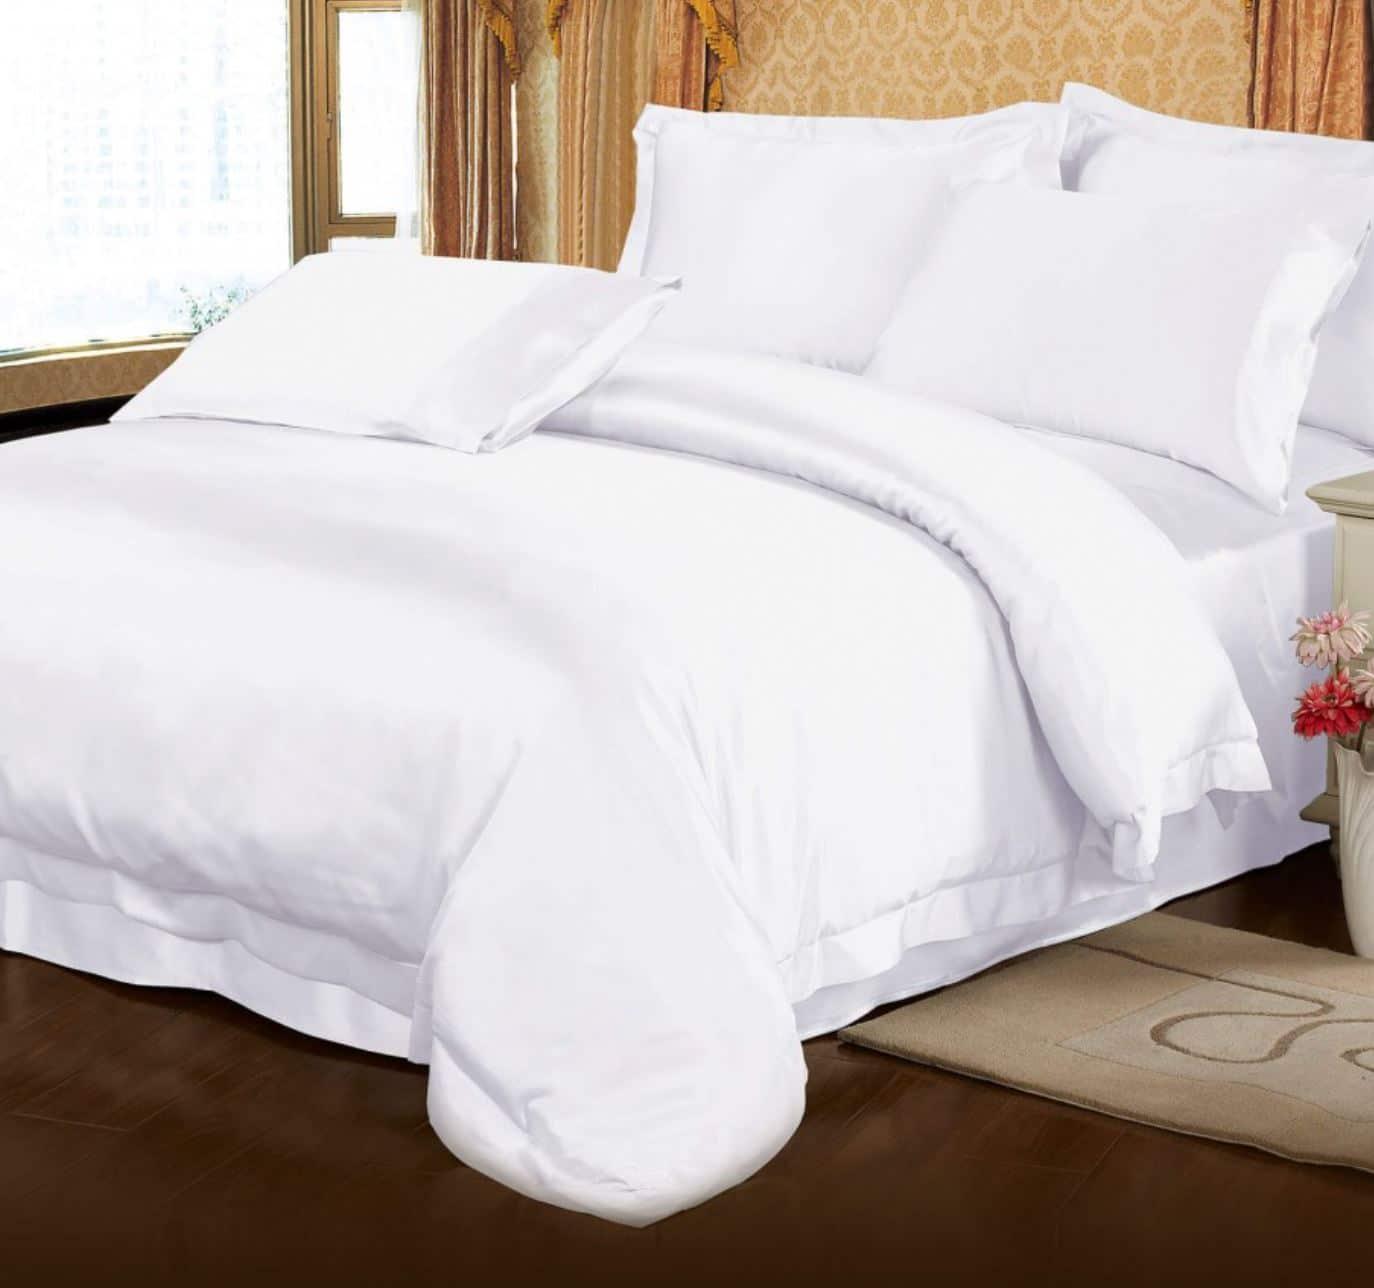 white silk sheets